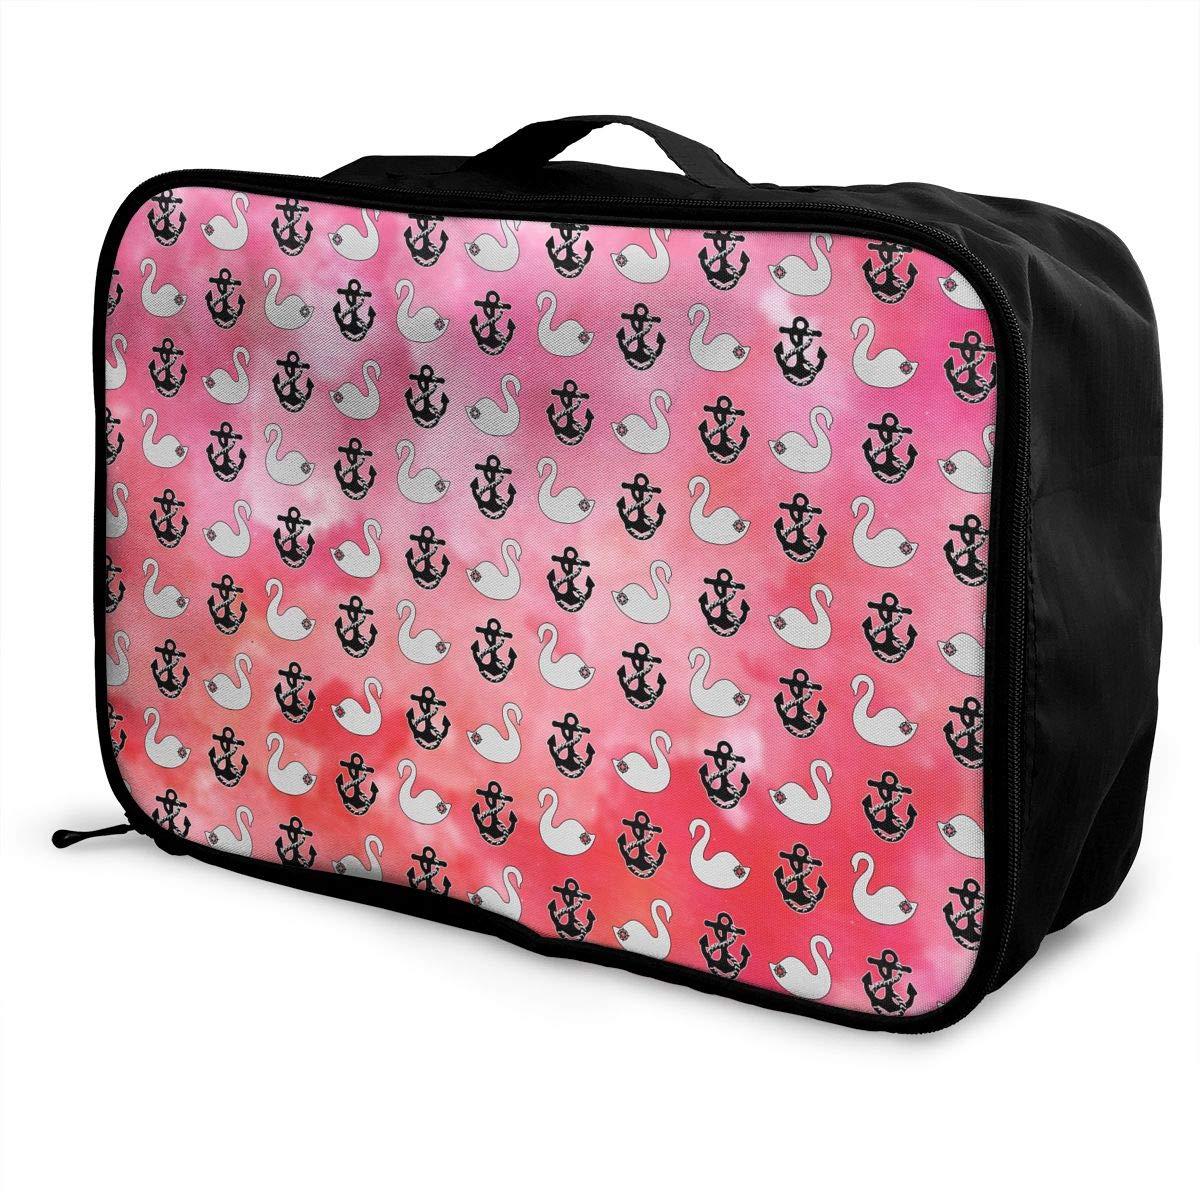 Travel Luggage Duffle Bag Lightweight Portable Handbag White Swan Black Anchor Pattern Large Capacity Waterproof Foldable Storage Tote